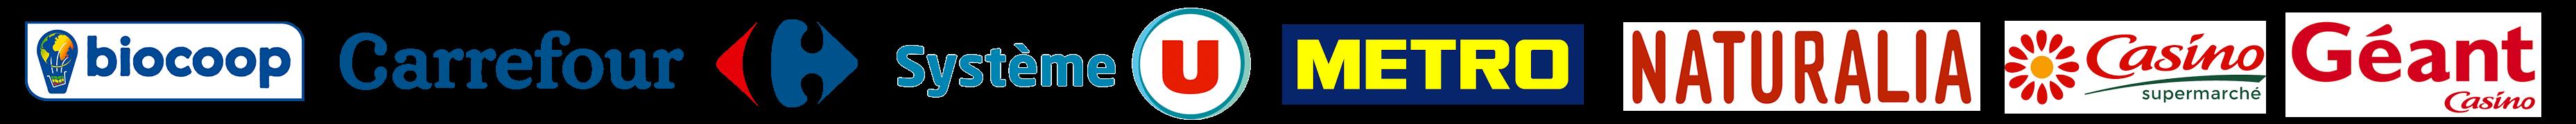 logos contact